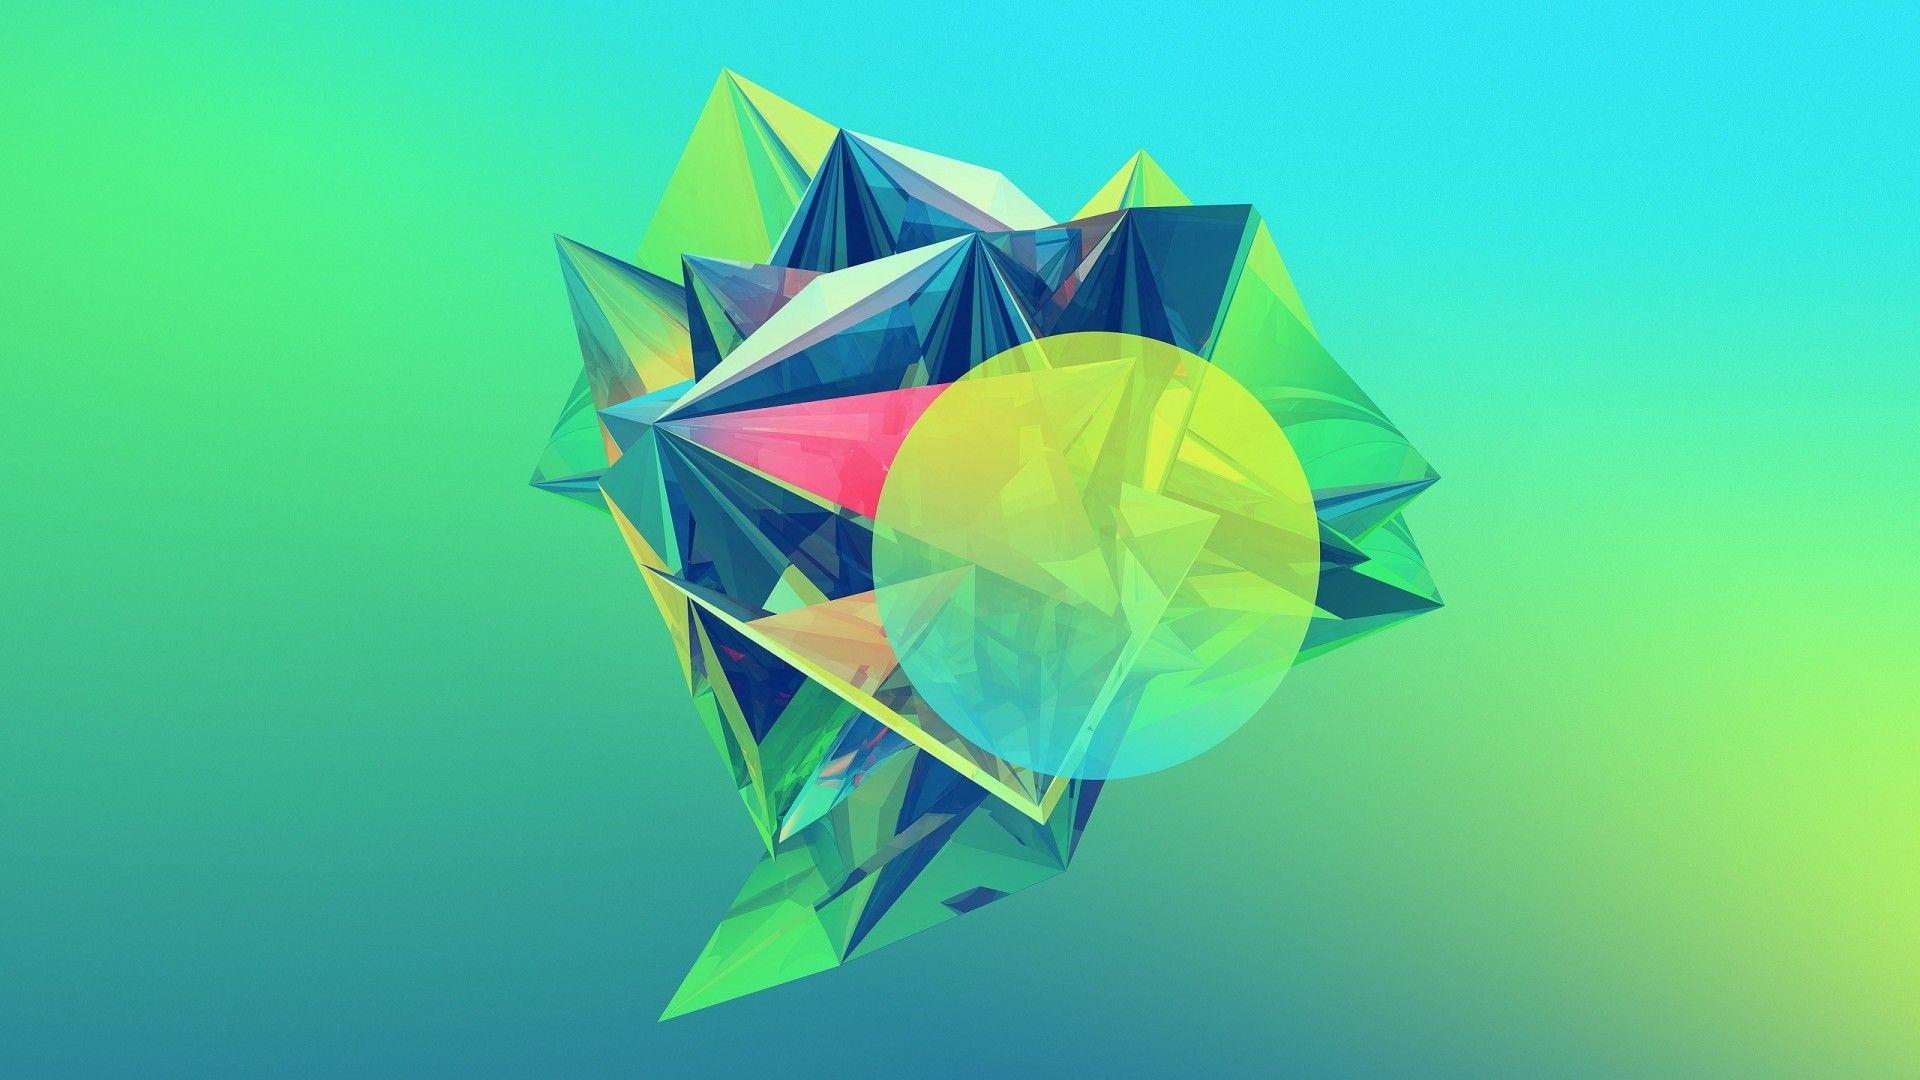 Vector Art background image